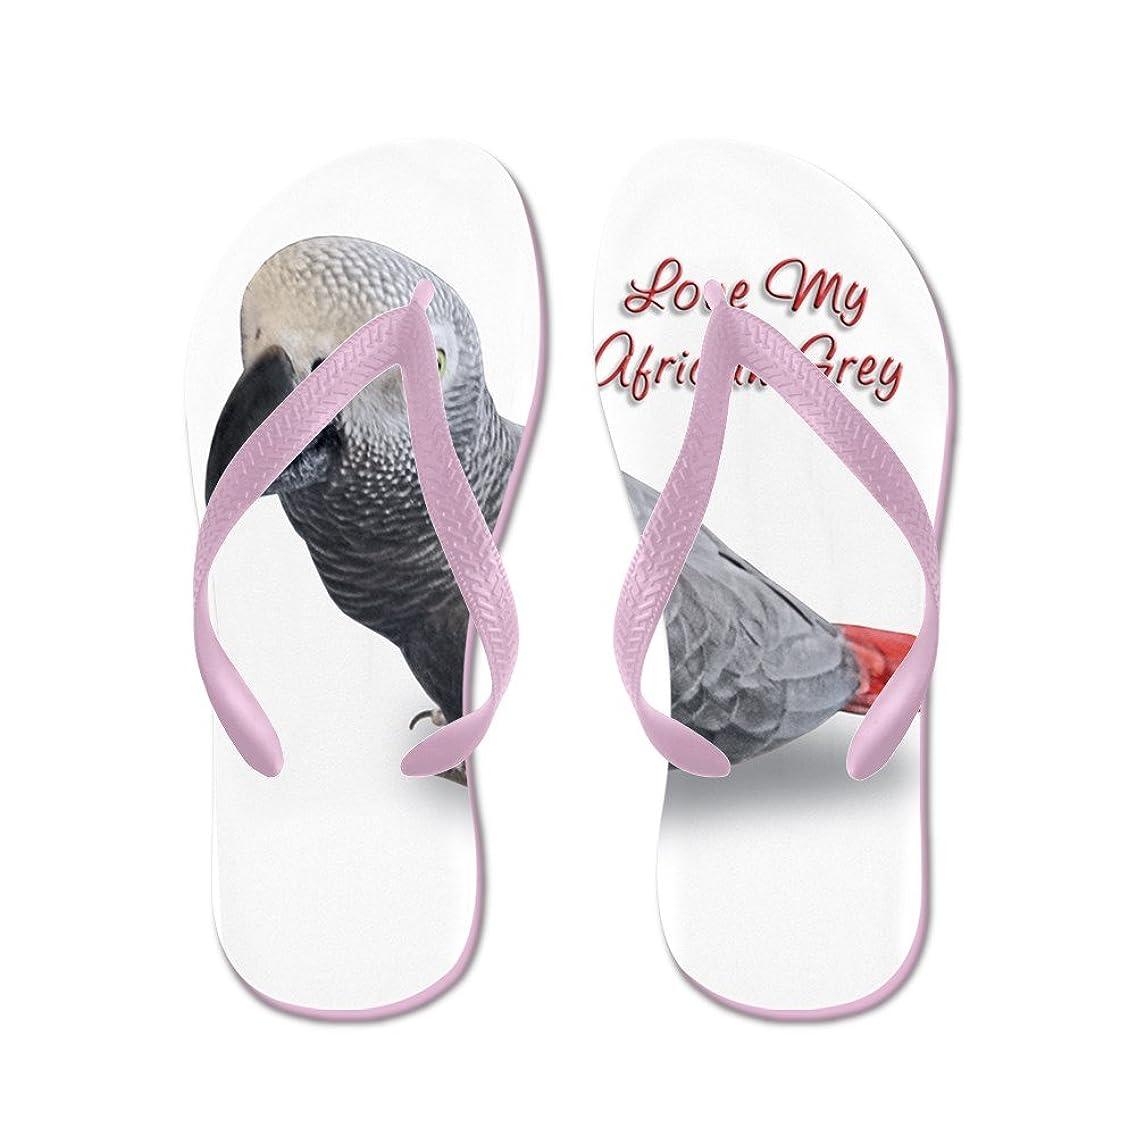 CafePress - African Grey Parrot Gifts - Flip Flops, Funny Thong Sandals, Beach Sandals